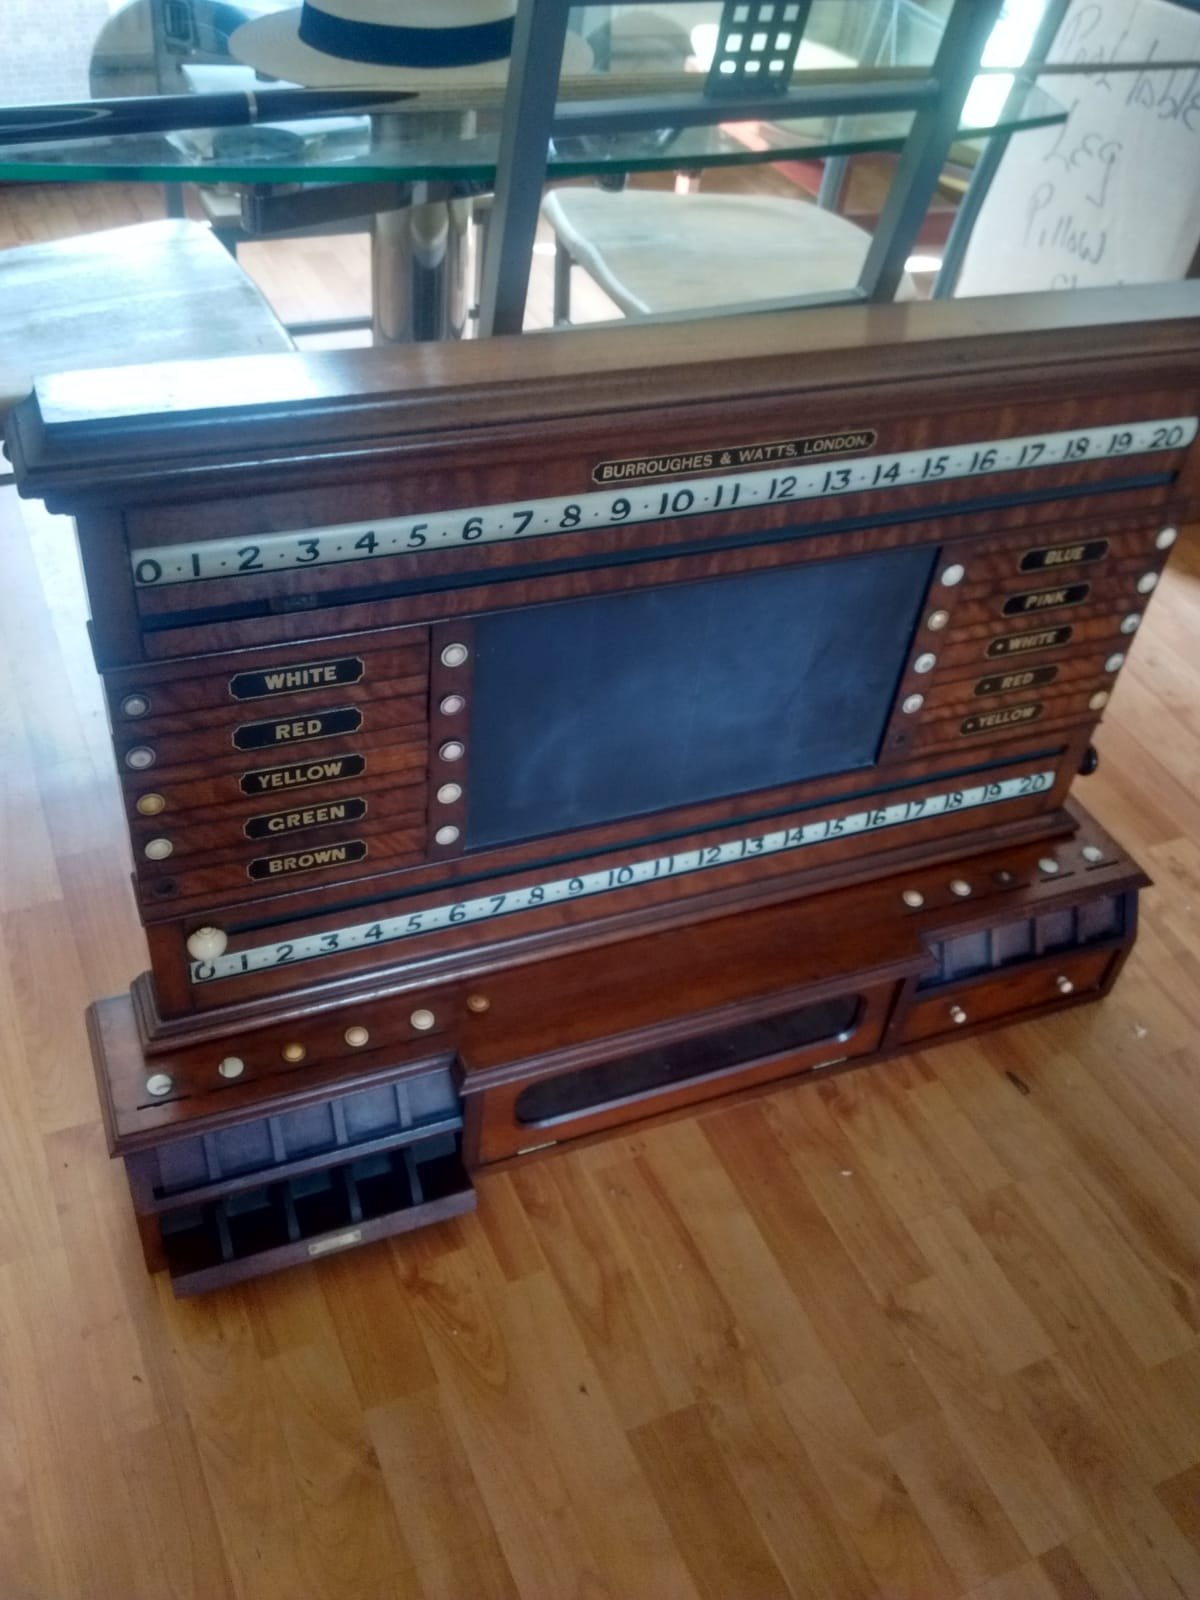 Burroughs-and-Watts-scoreboard-2